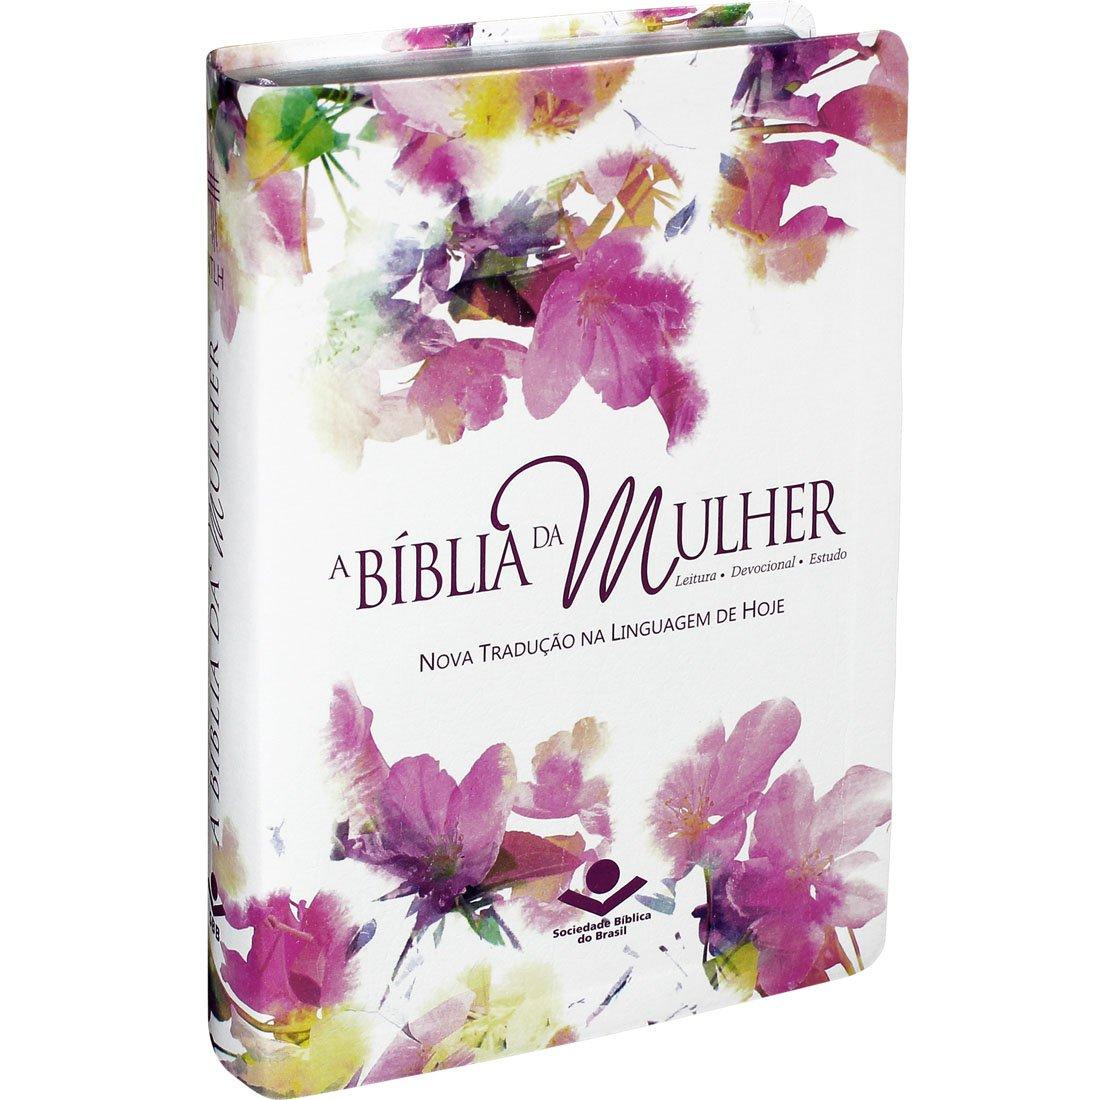 A Bíblia da Mulher (Biblia de la Mujer) / The Womans Bible (Portuguese Edition) pdf